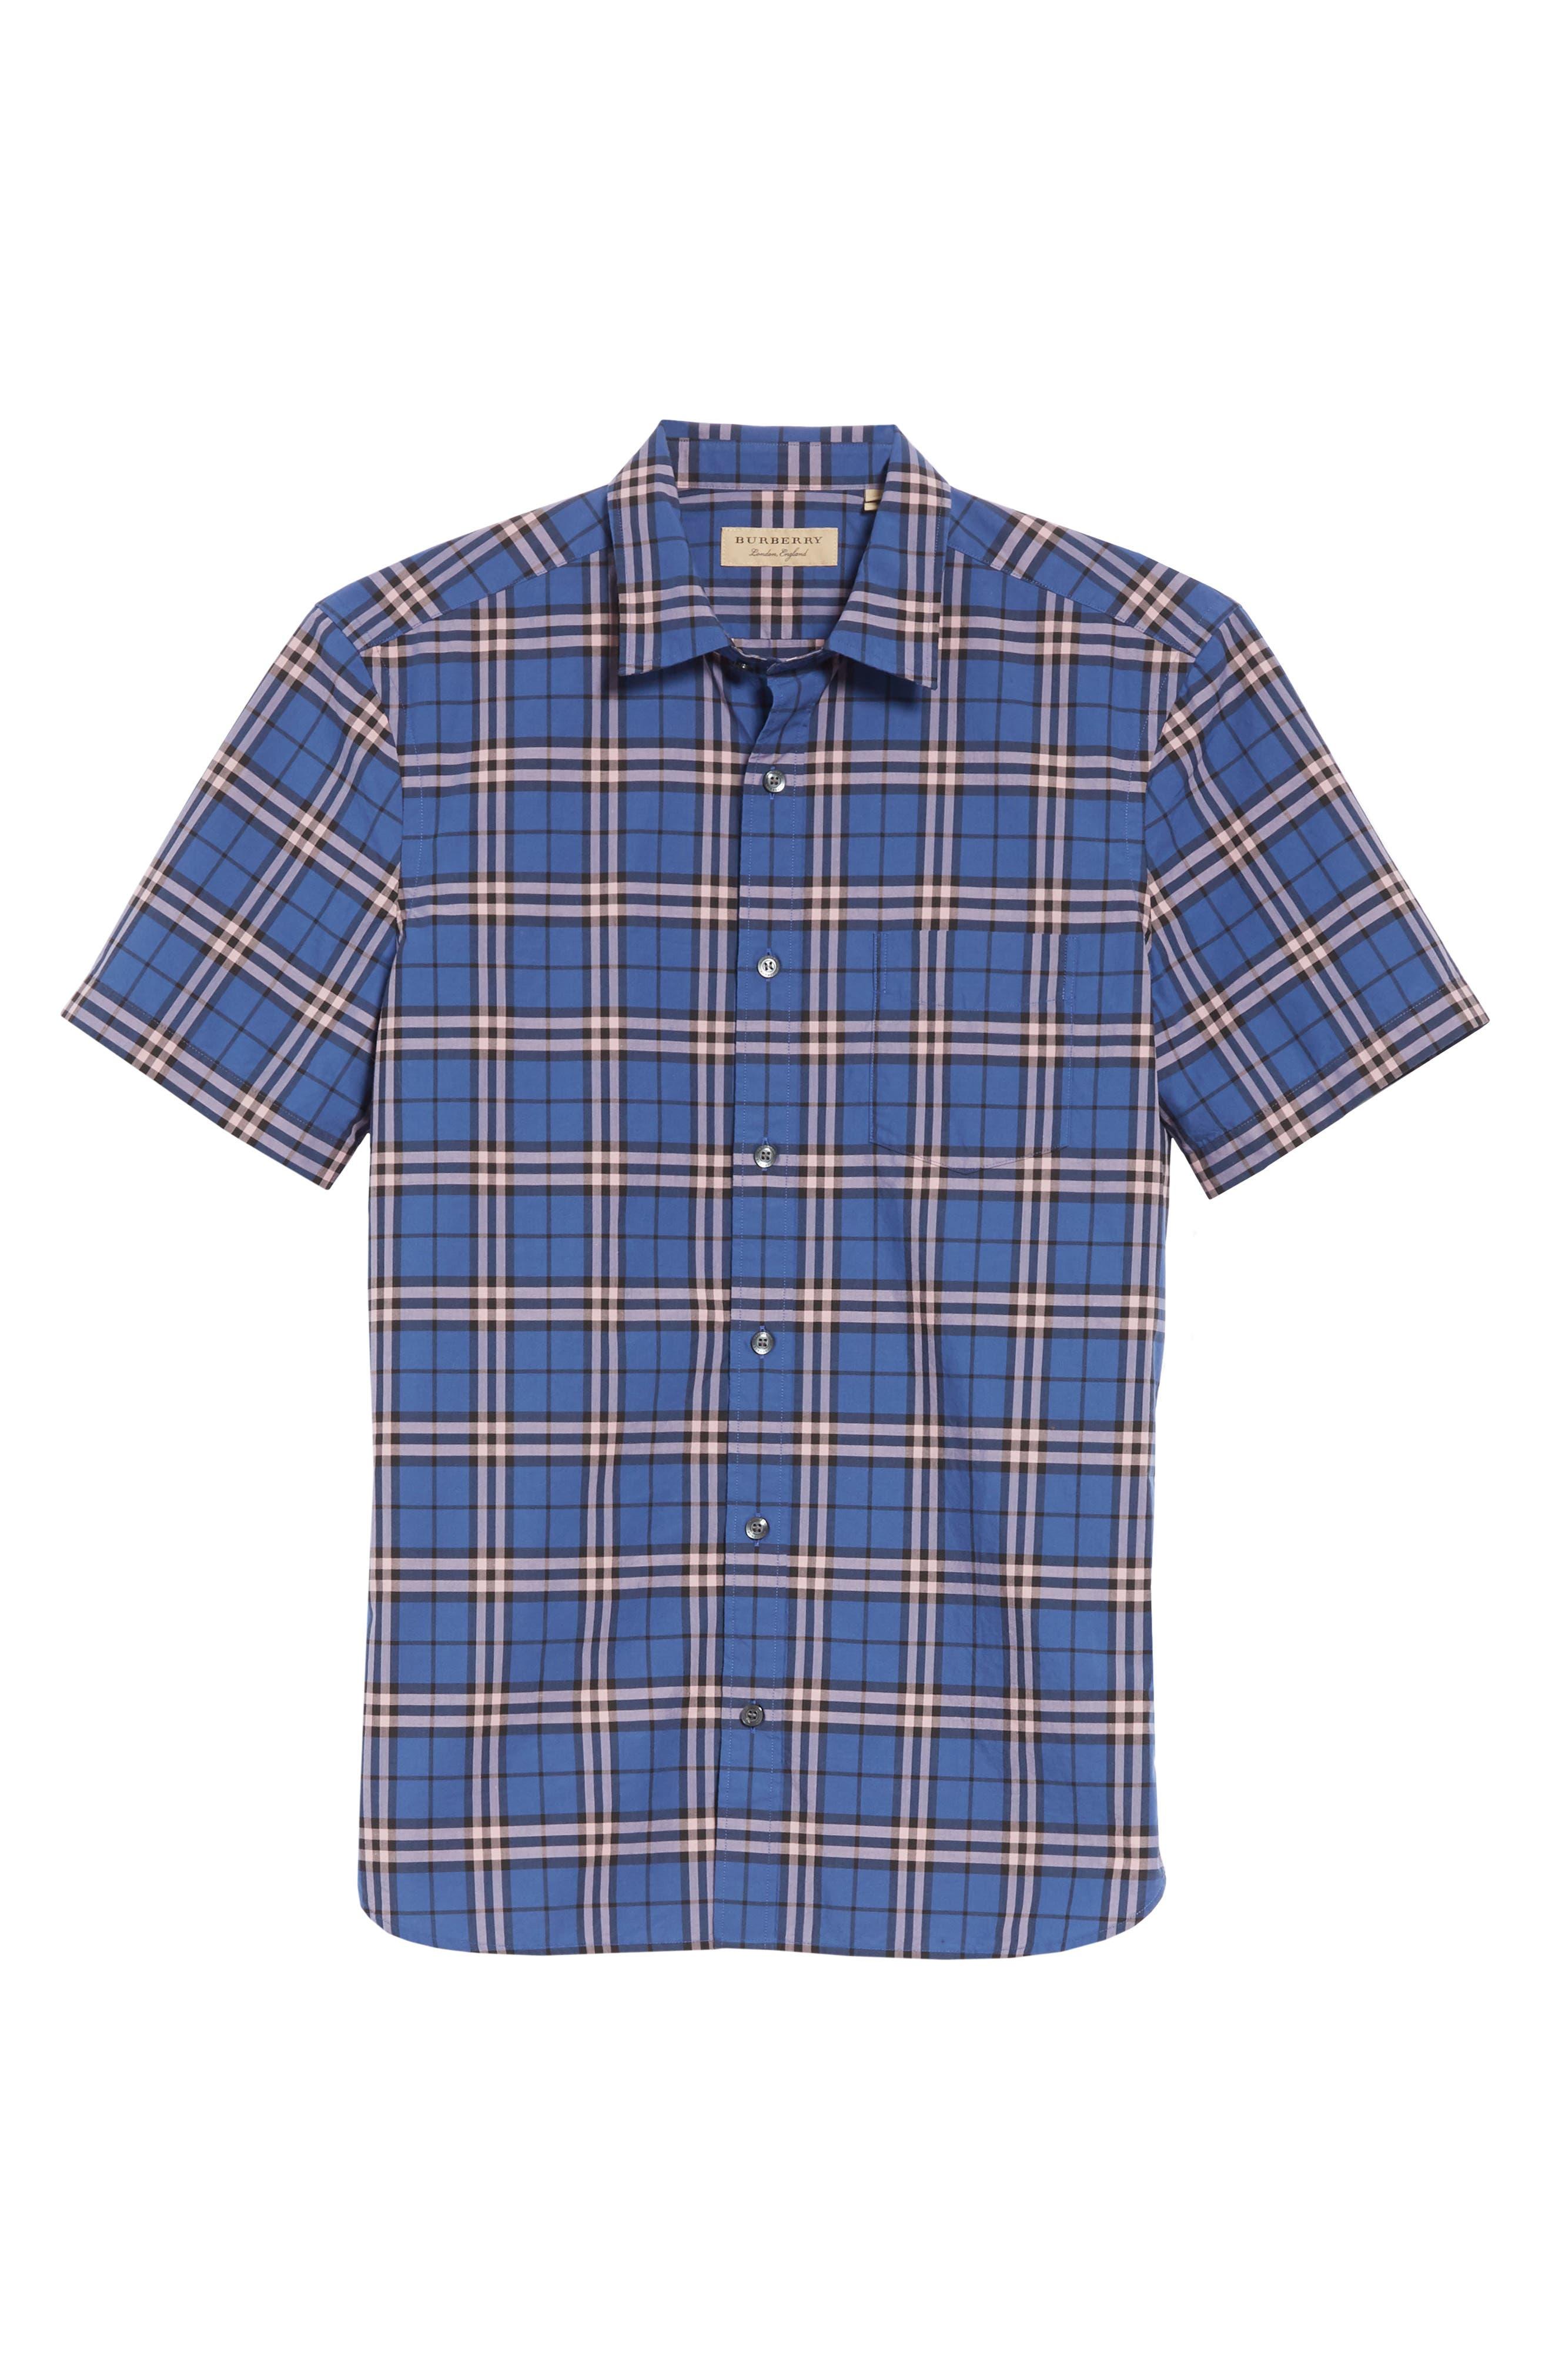 Alexander Check Shirt,                             Alternate thumbnail 6, color,                             409